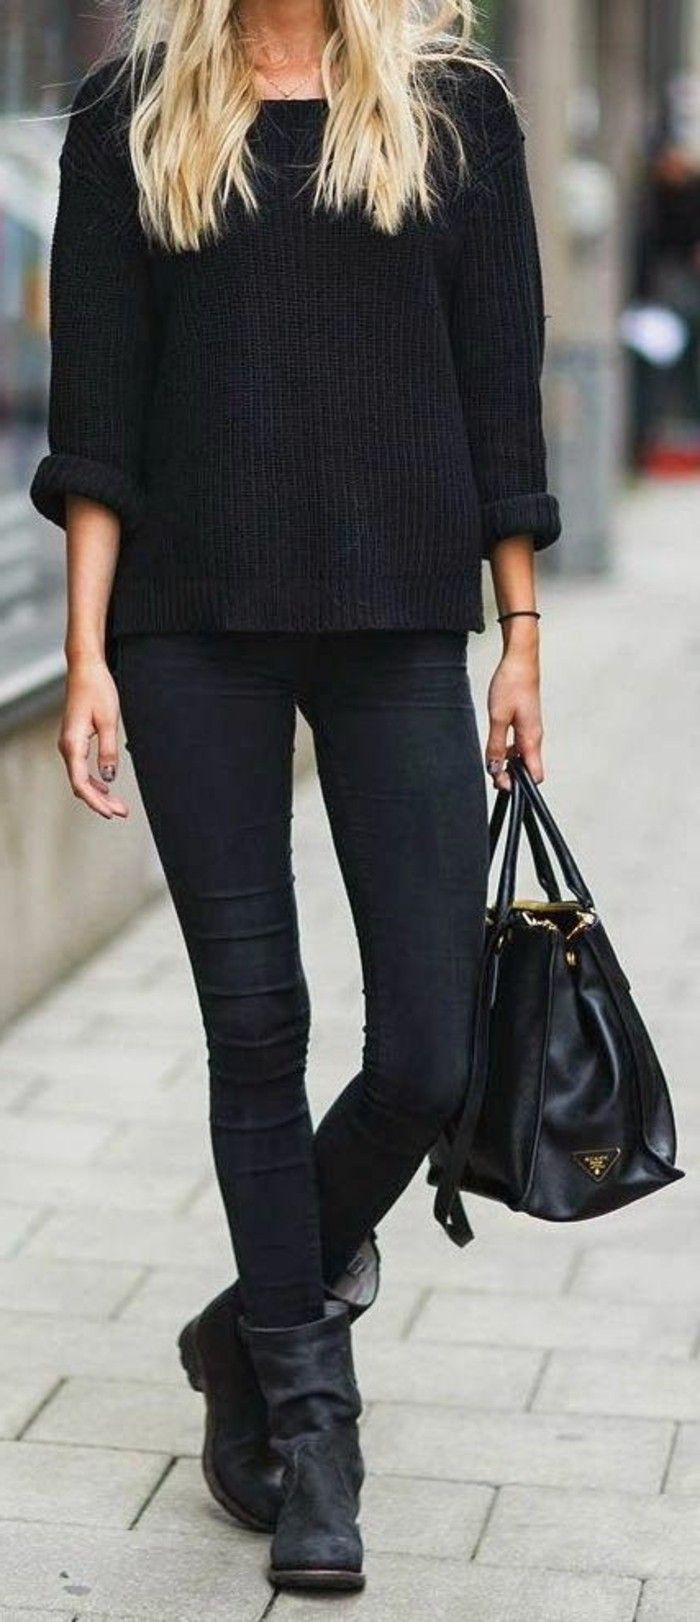 Geox bottines femmes bottines lacets femme chic                                                                                                                                                                                 Plus